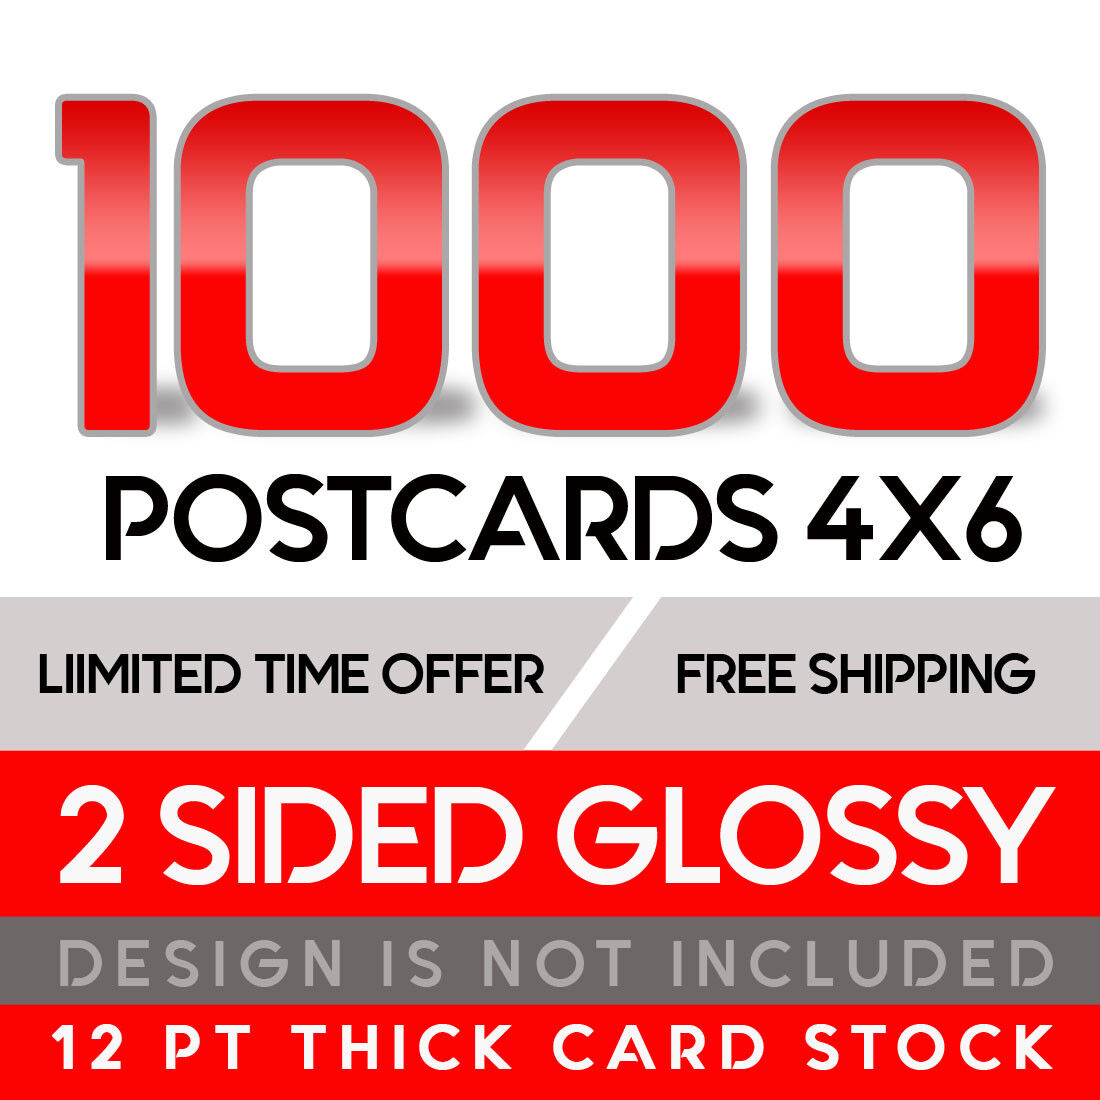 1000 Custom Full Color 4x6 16PT Postcards W/UV Glossy  - $39.00